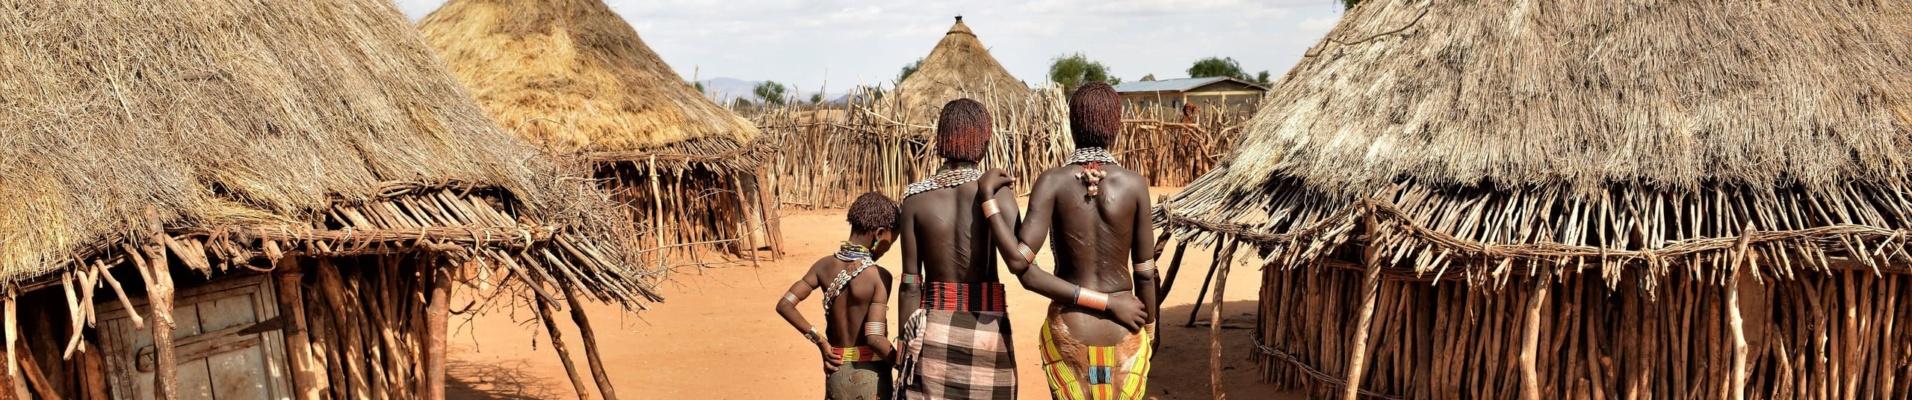 Femme d'une tribu en Ethiopie